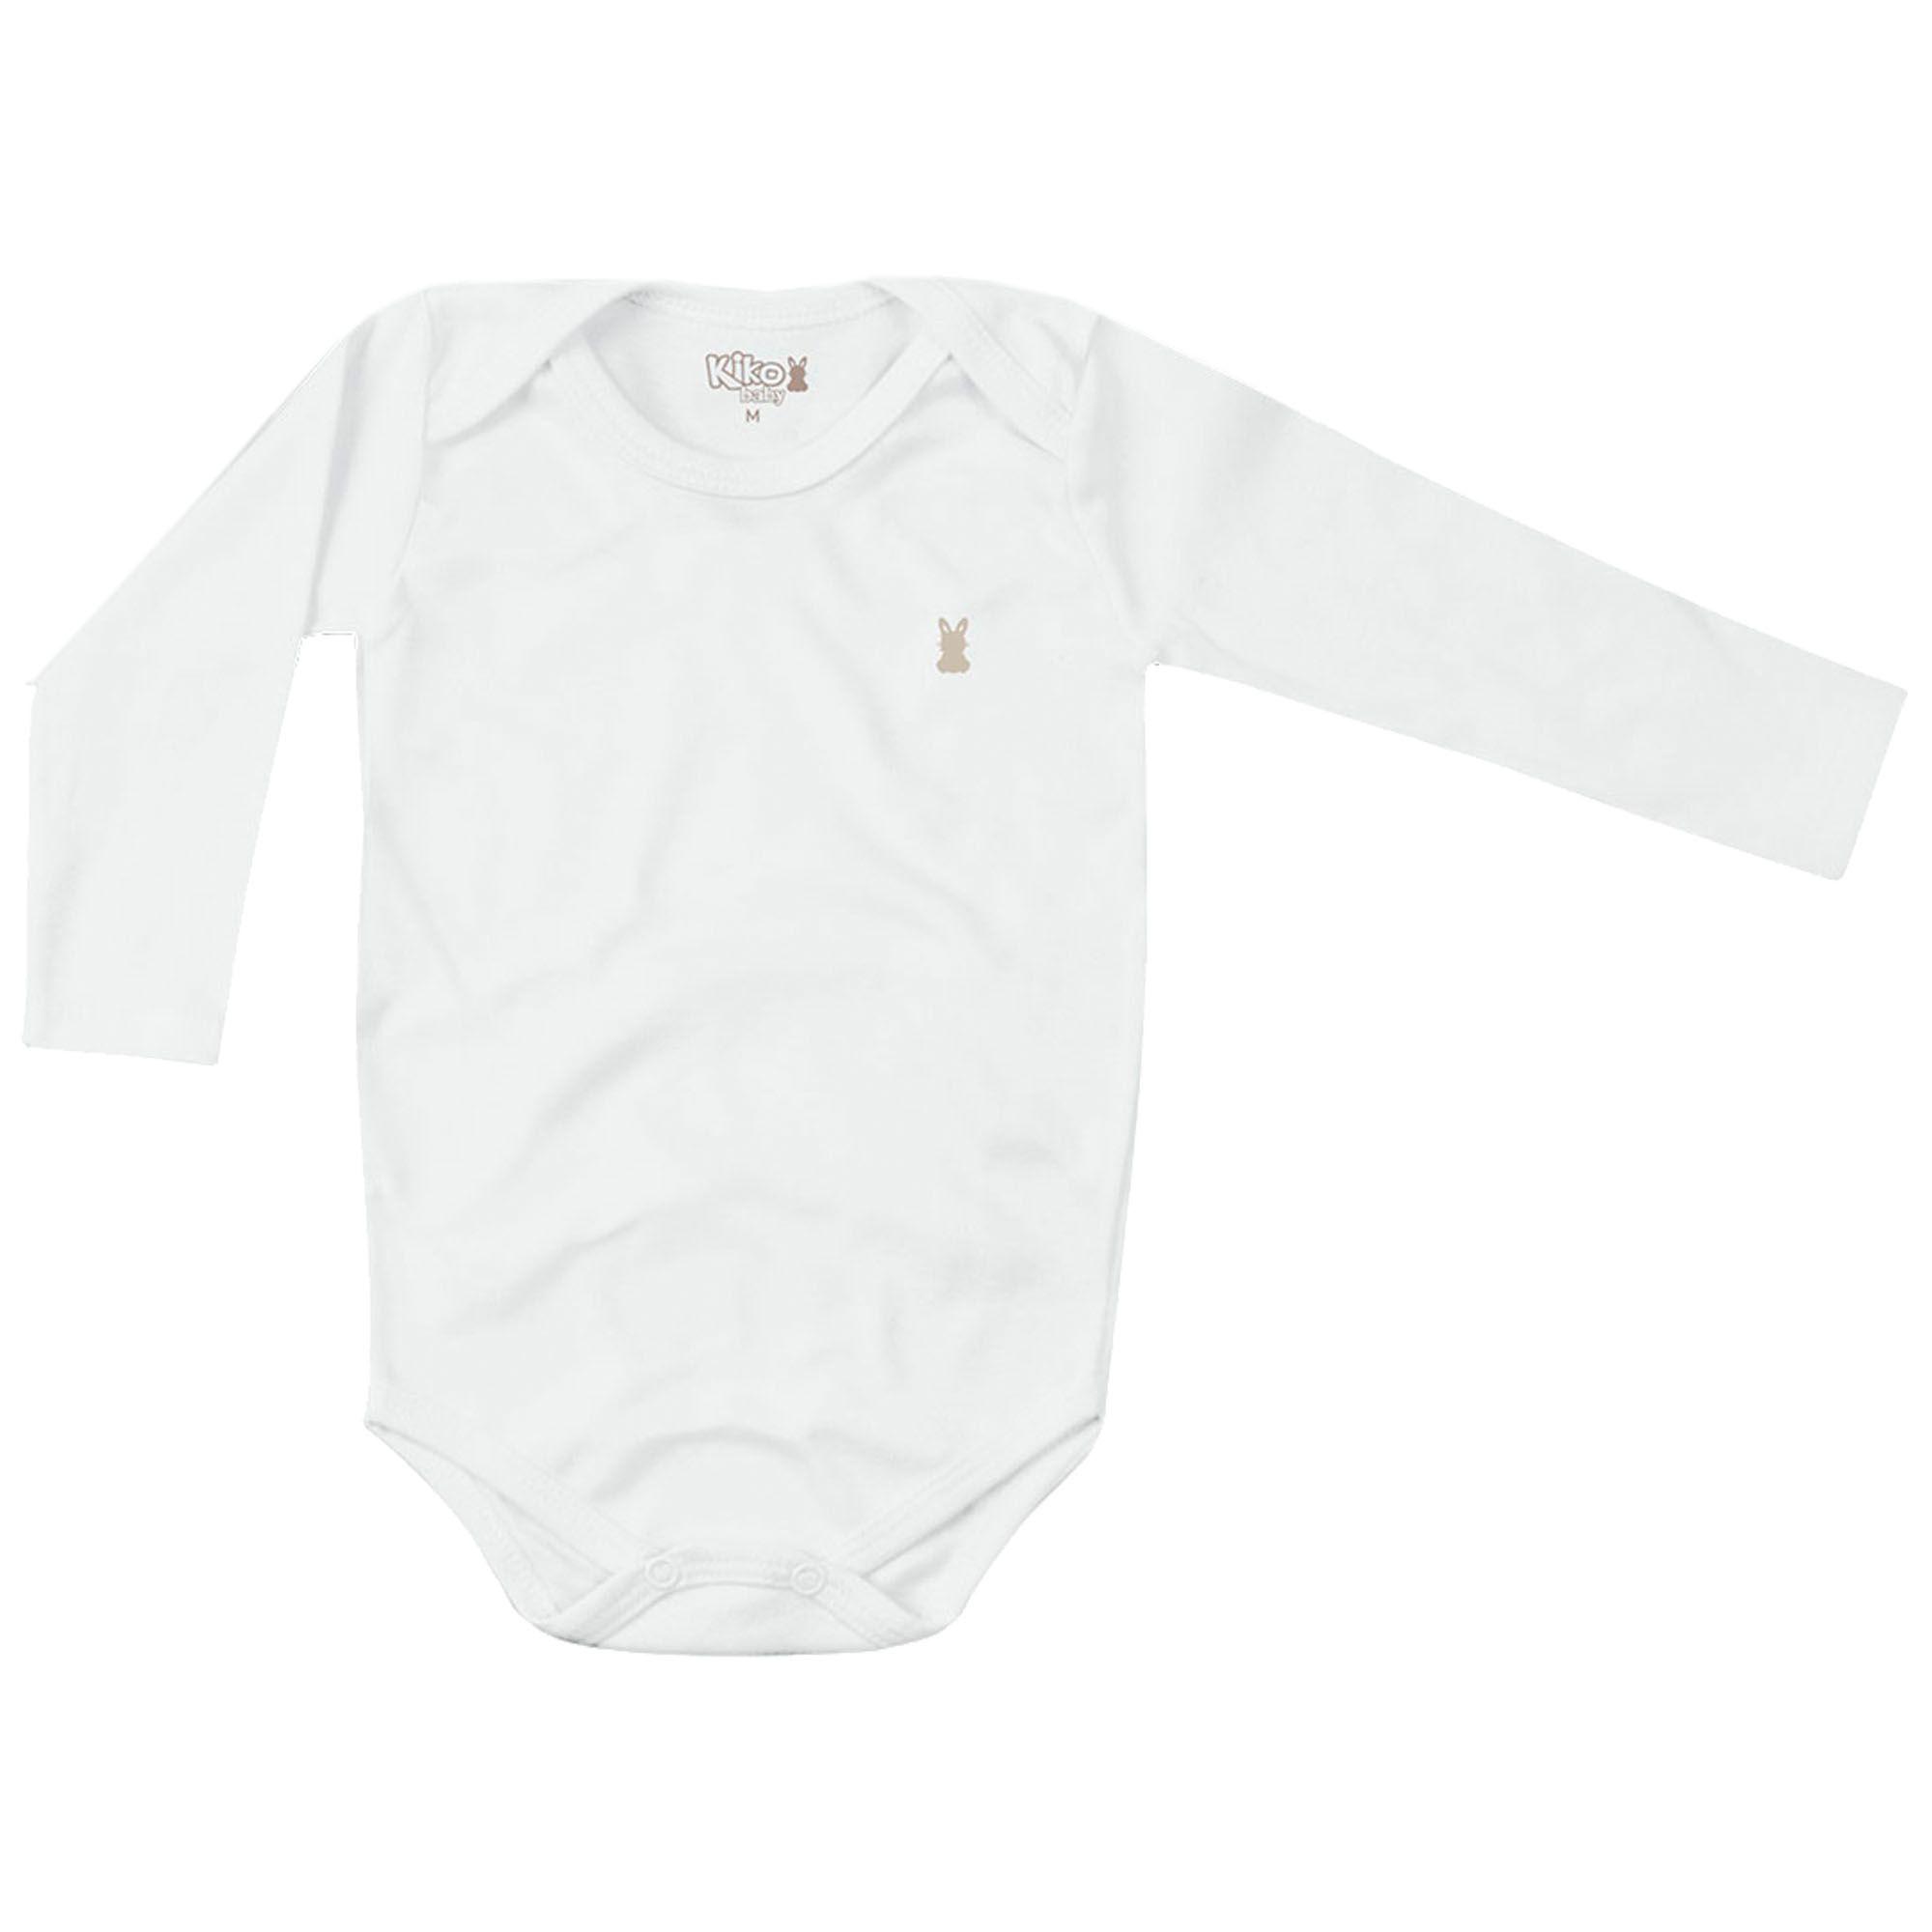 Body Kiko Baby Branco Liso - RN ao G